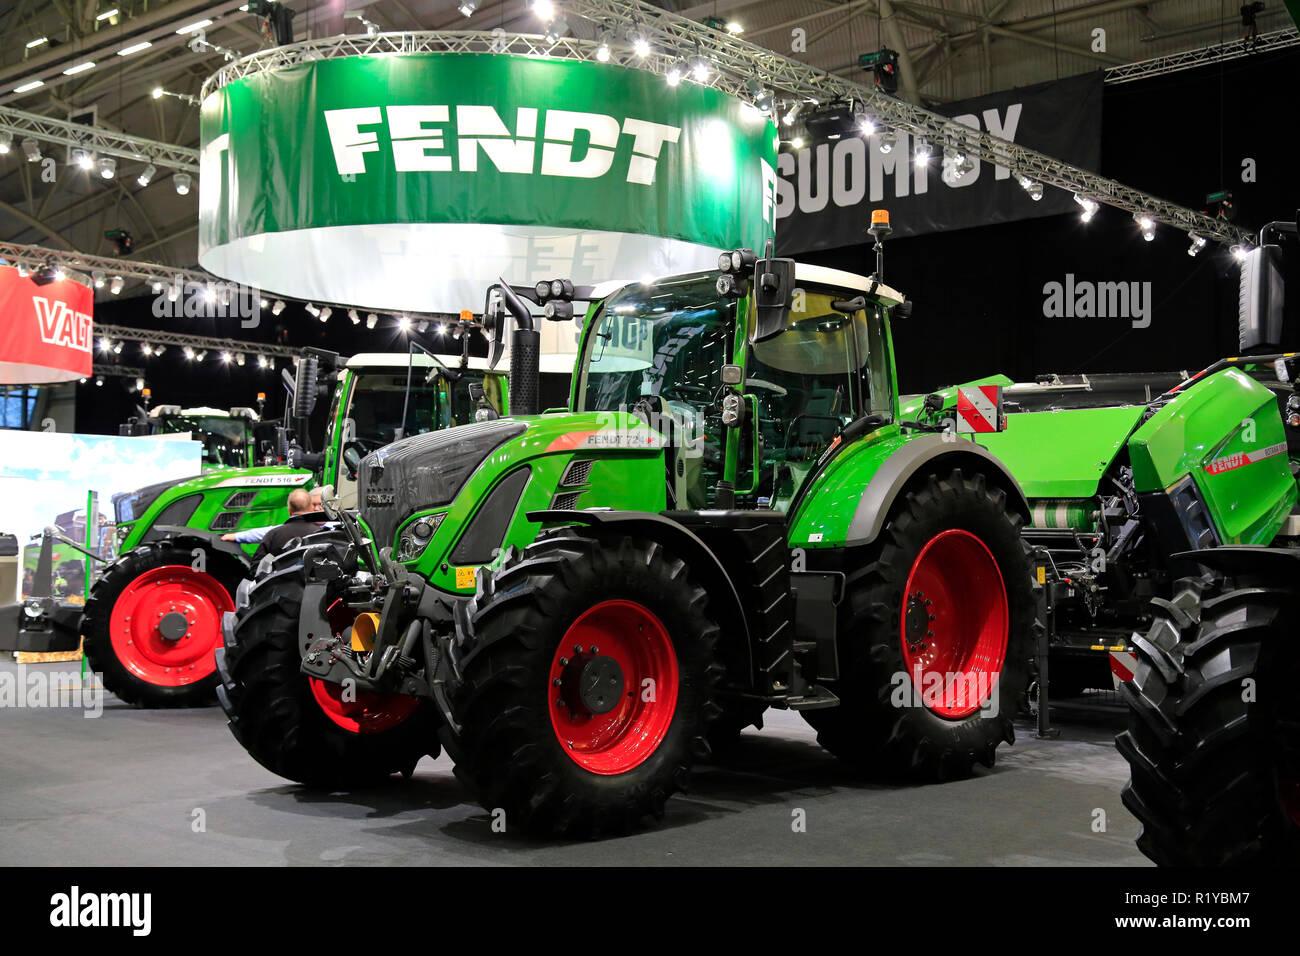 Helsinki, Finland - November 15, 2018: Fendt 724 Vario tractor displayed on  Agco Finland stand on MaatalousKonemessut Agricultural Trade Fair,  Helsinki, ...